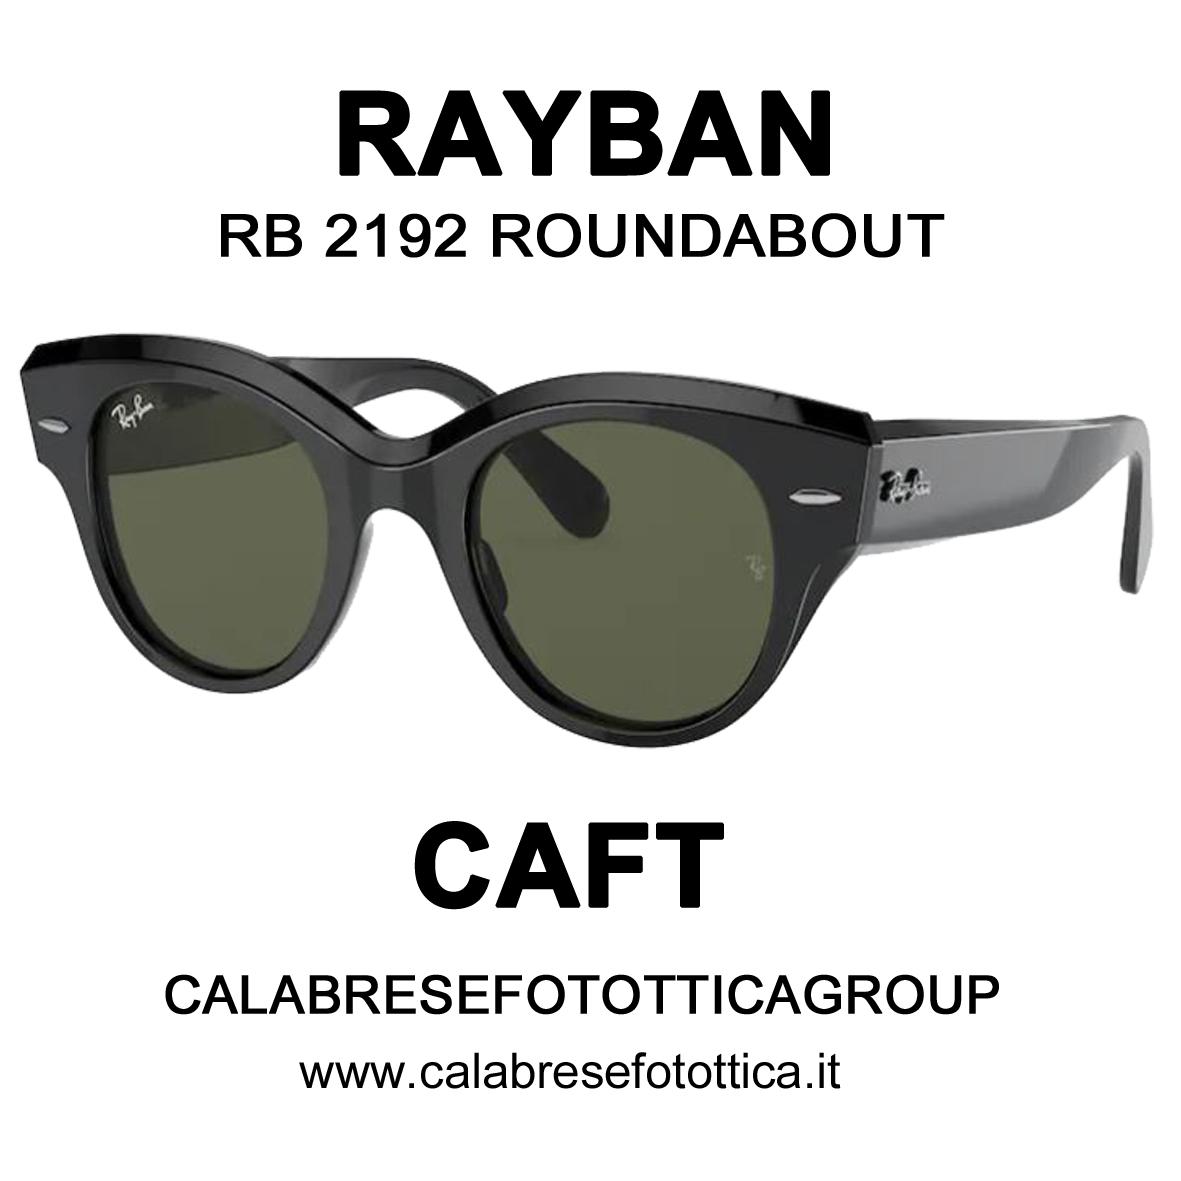 RAYBAN SOLE RB 2192 ROUNDABOUT DA CAFT CALABRESE FOTOTTICA GROUP VIA EMILIA 68/72 SAN LAZZARO DI SAVENA